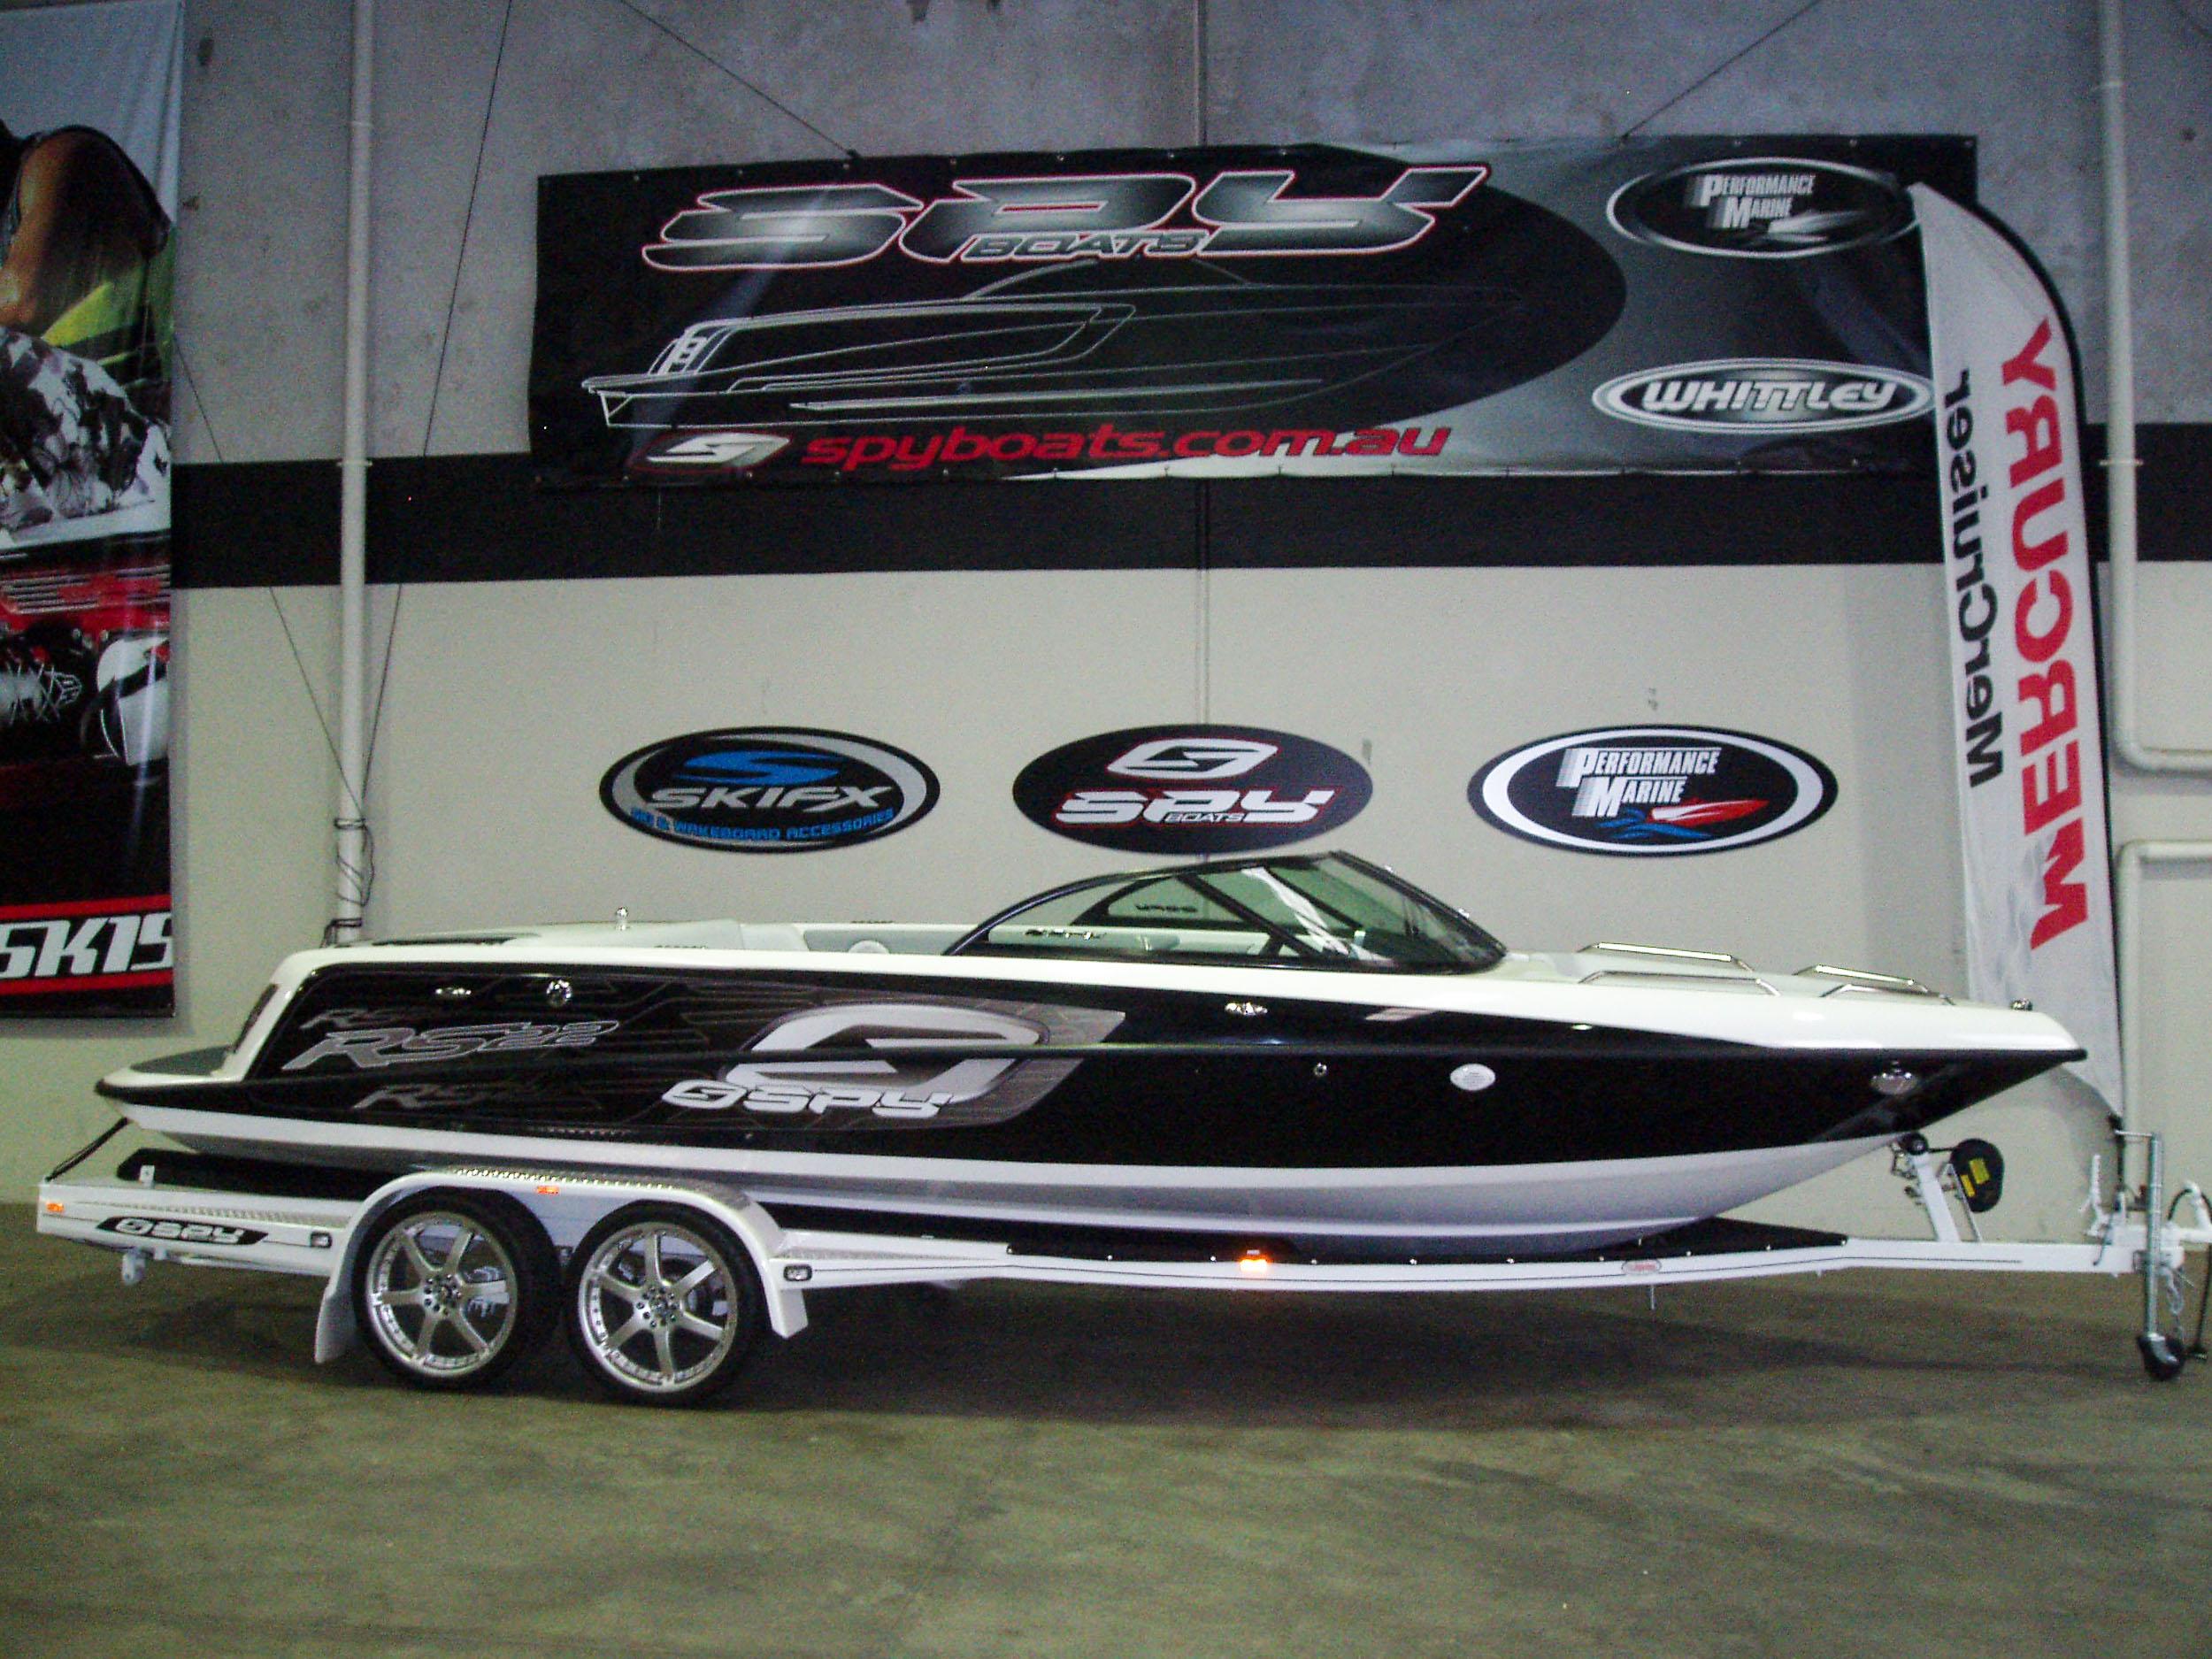 Spy_Boats_RS22-1.jpg